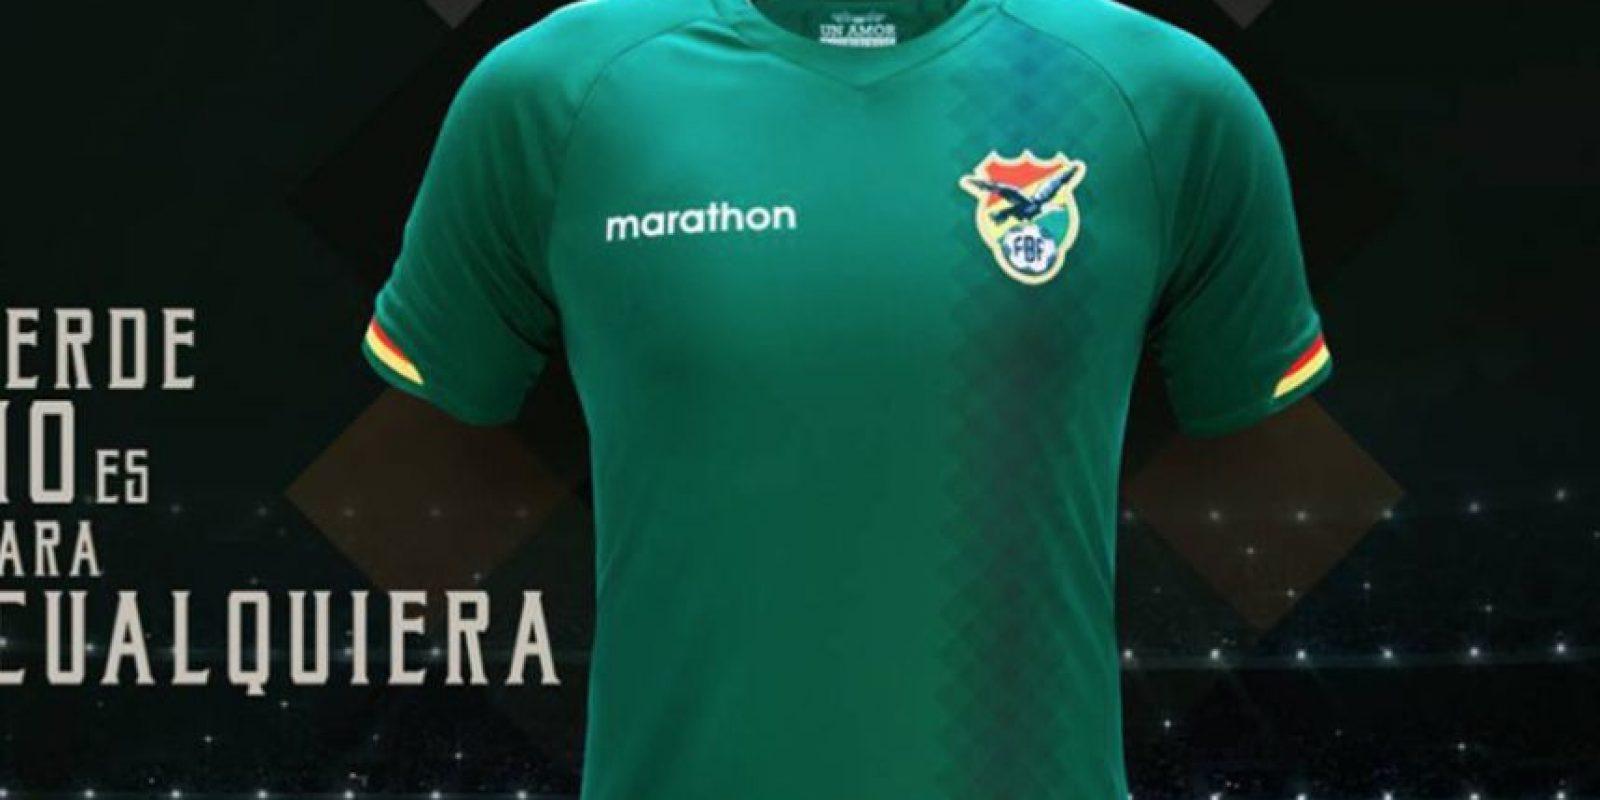 Foto:Tomado de http://www.marketingdelosdeportes.com/index.php/nueva-camiseta-marathon-de-la-seleccion-de-bolivia/